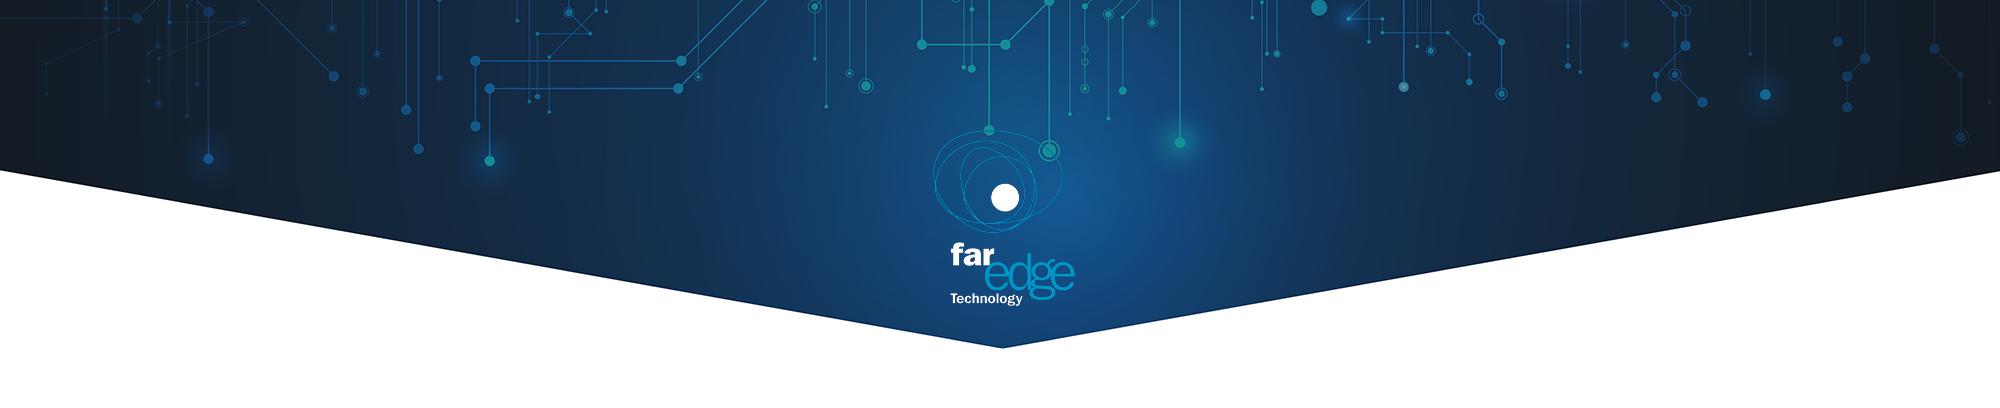 Far Edge Technology